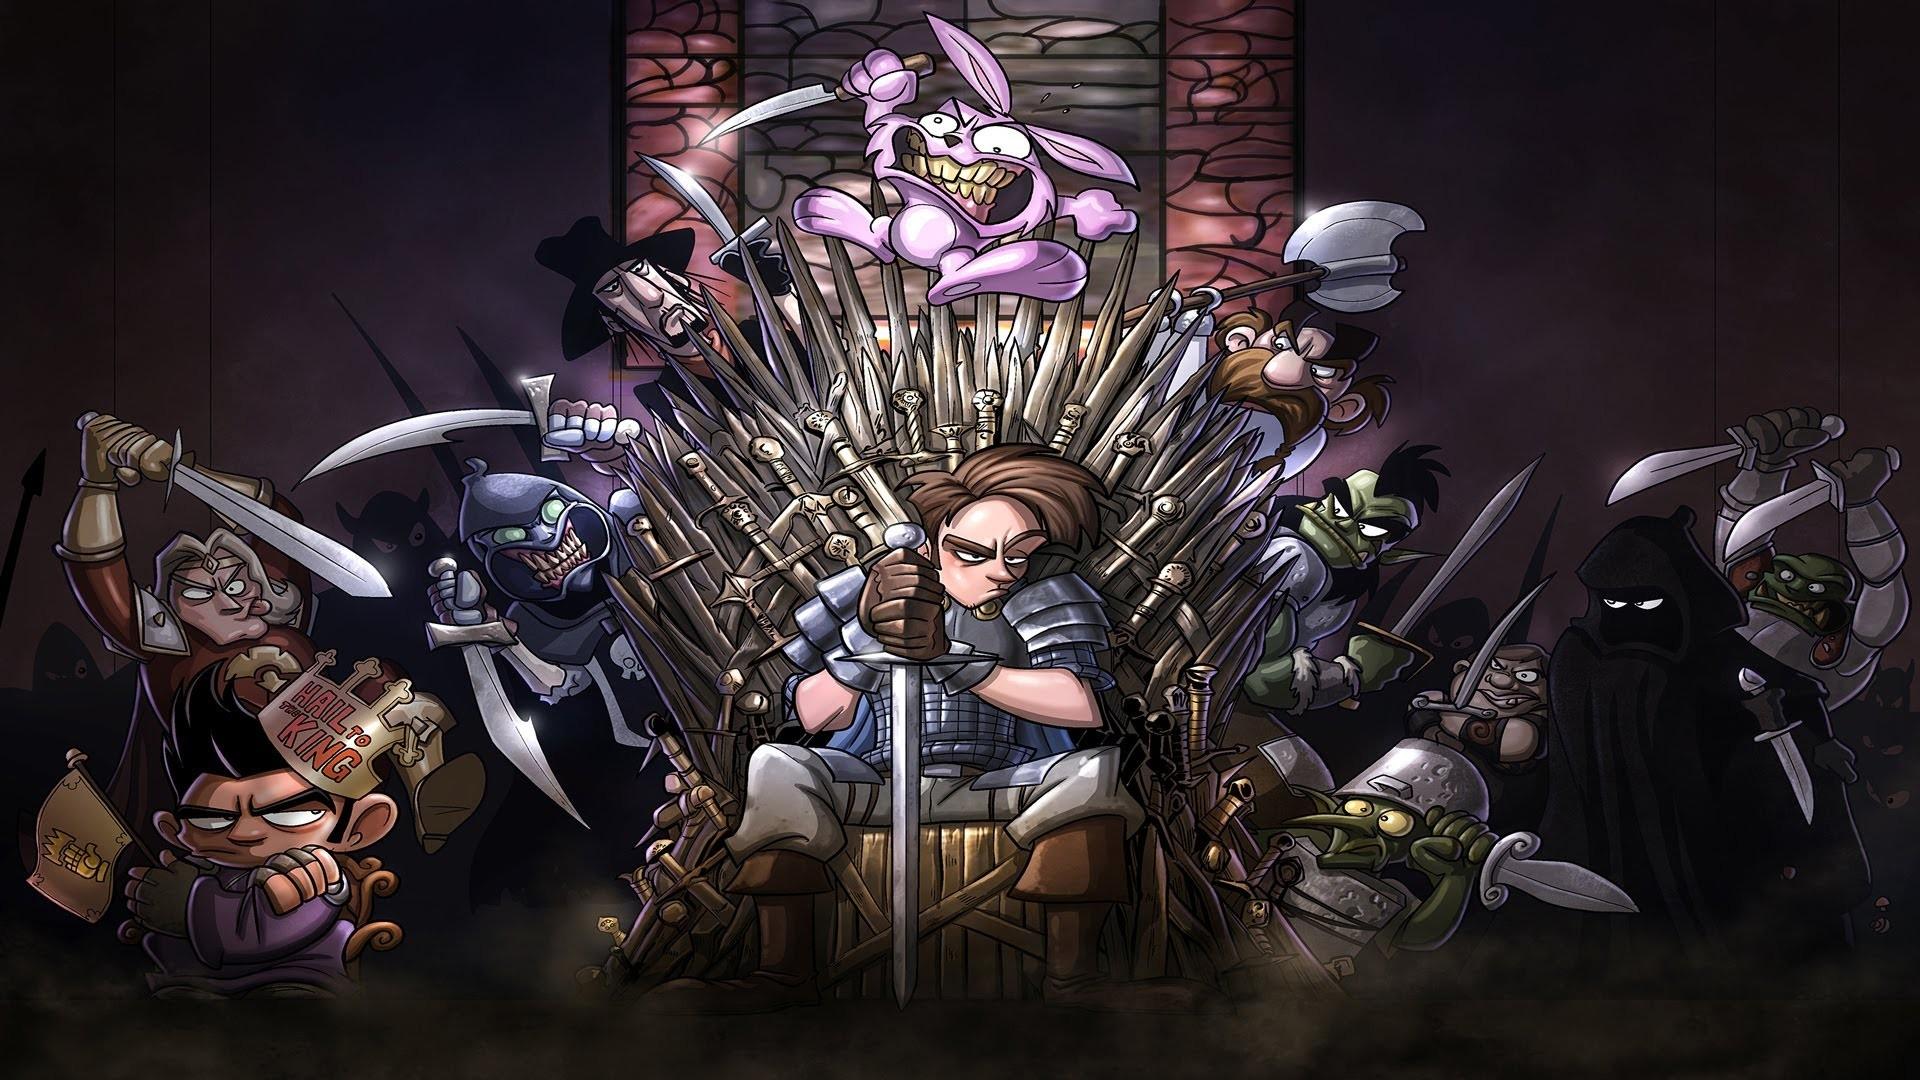 Wallpaper Video Games Anime Game Of Thrones Comics Mythology